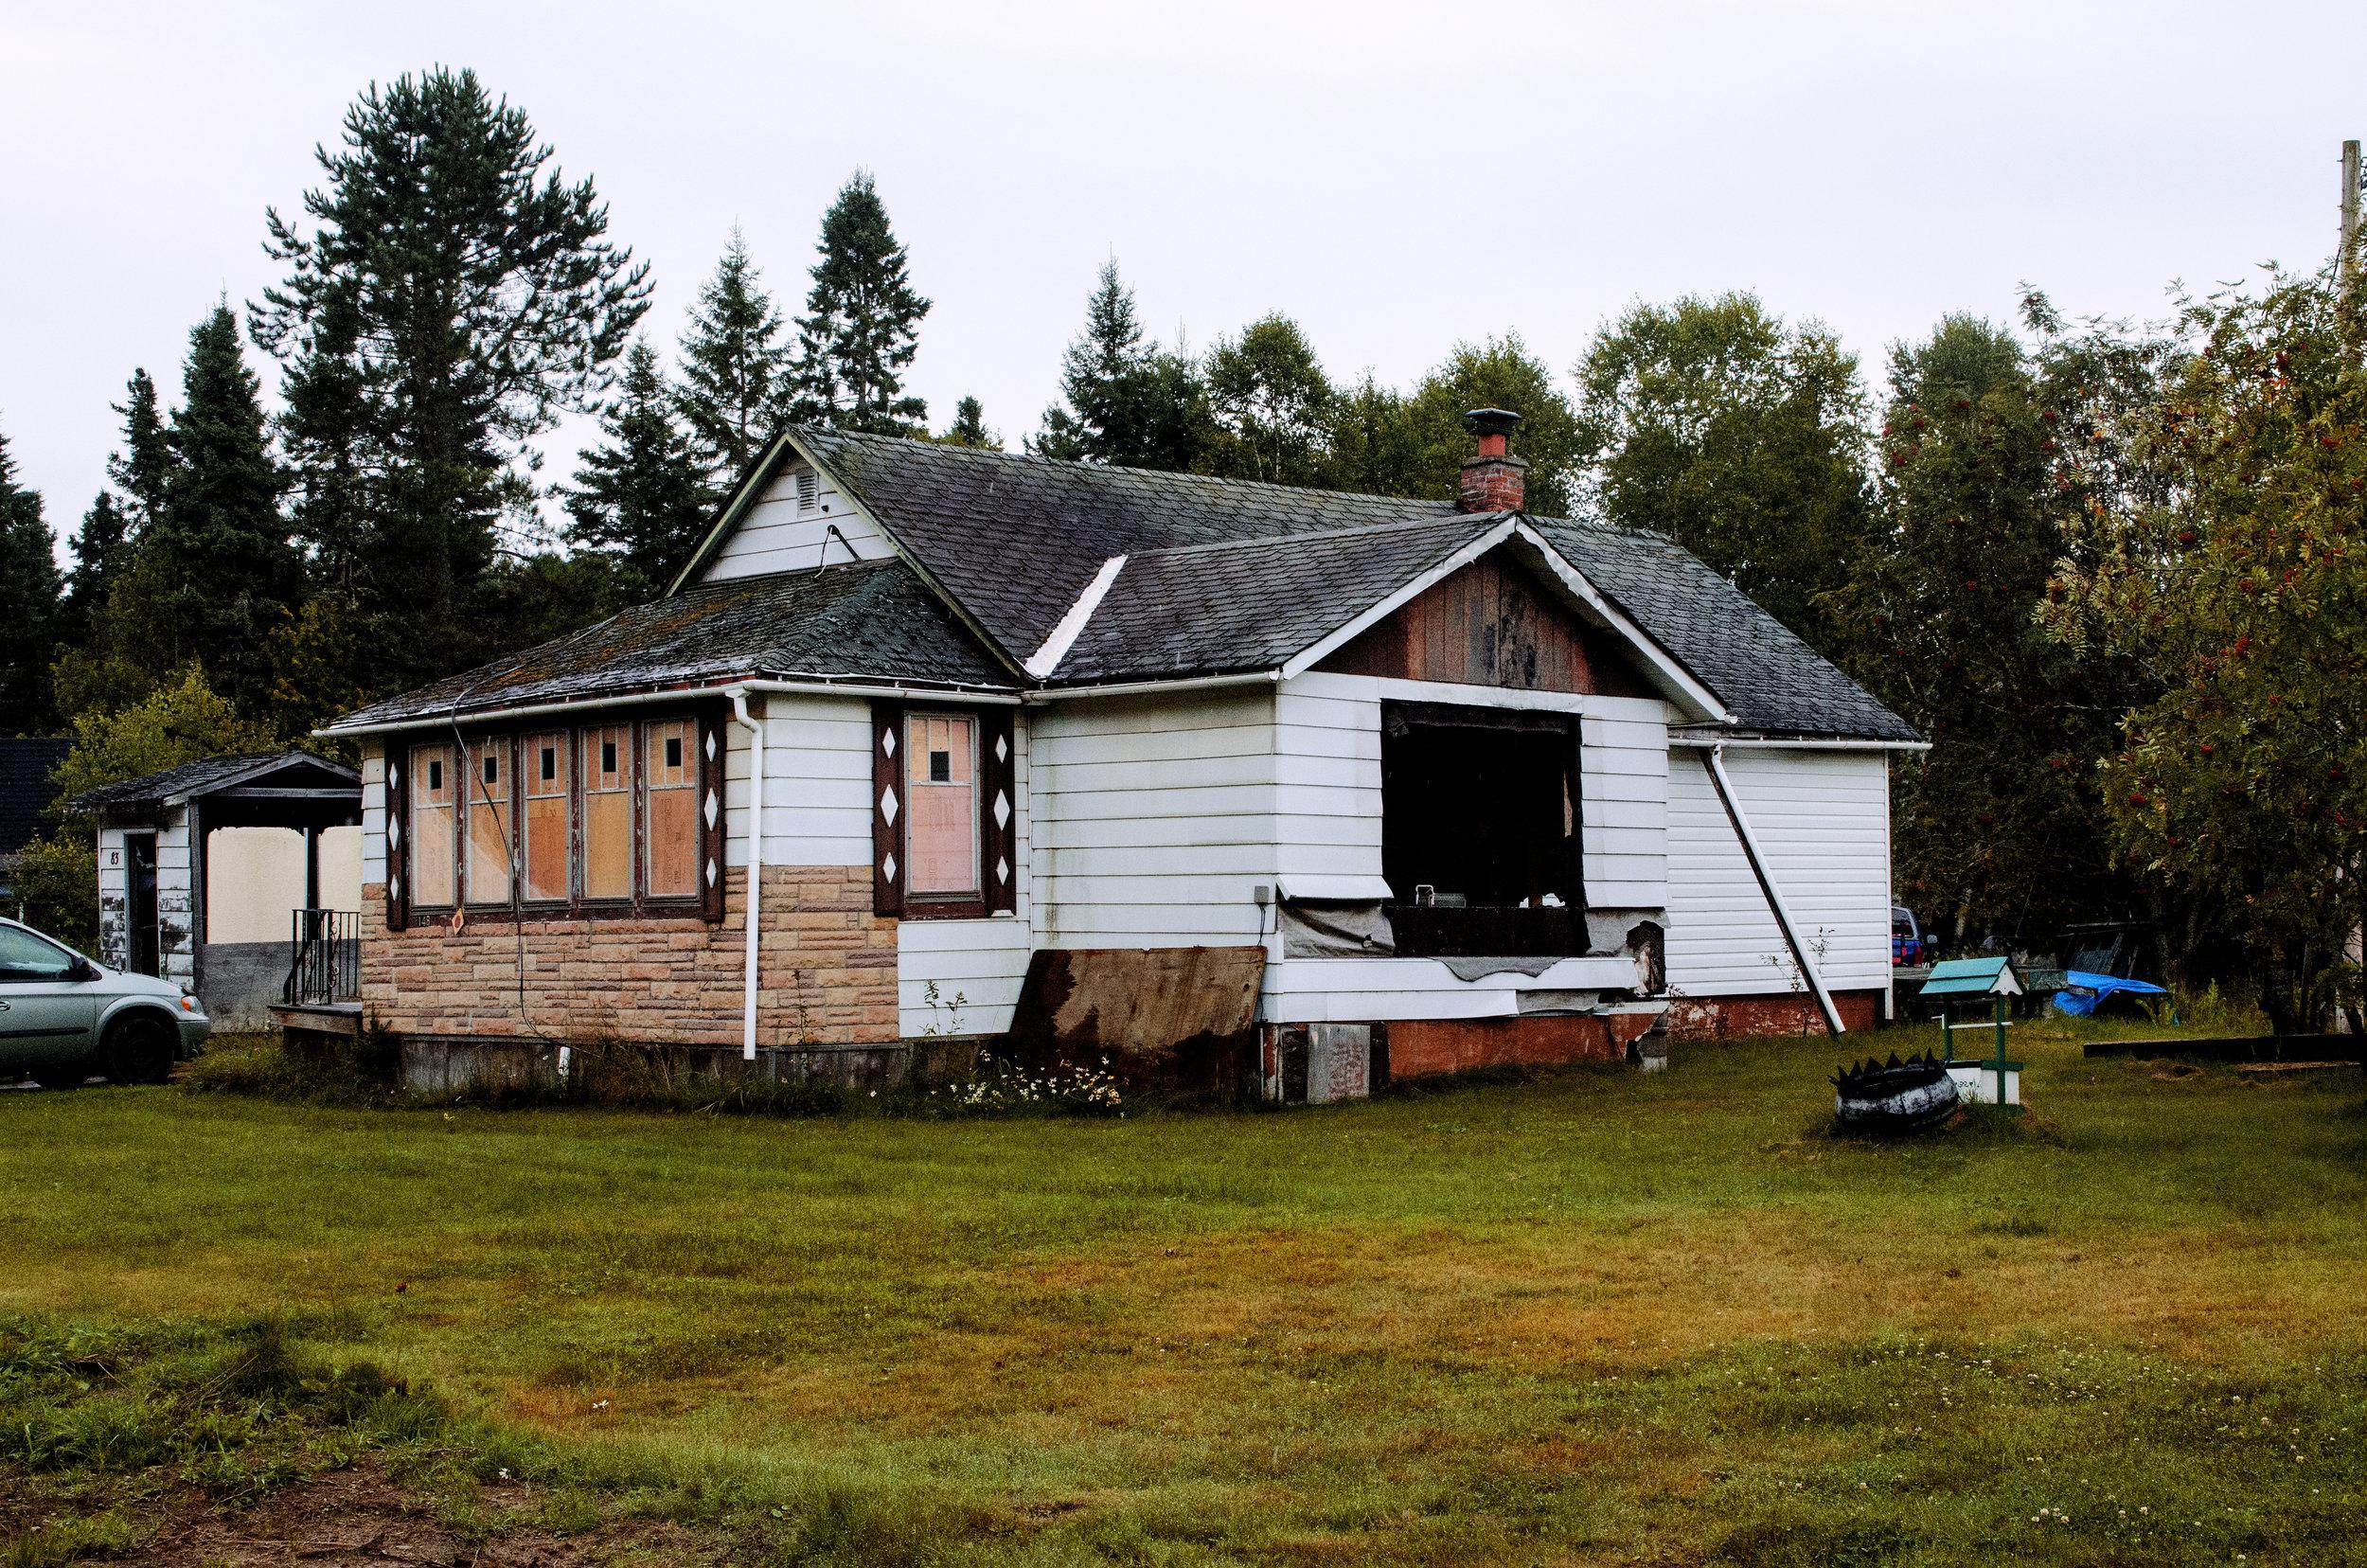 Jenkins, Cheyenne. No Window. 2017. Digital Photography. Wawa, Ontario